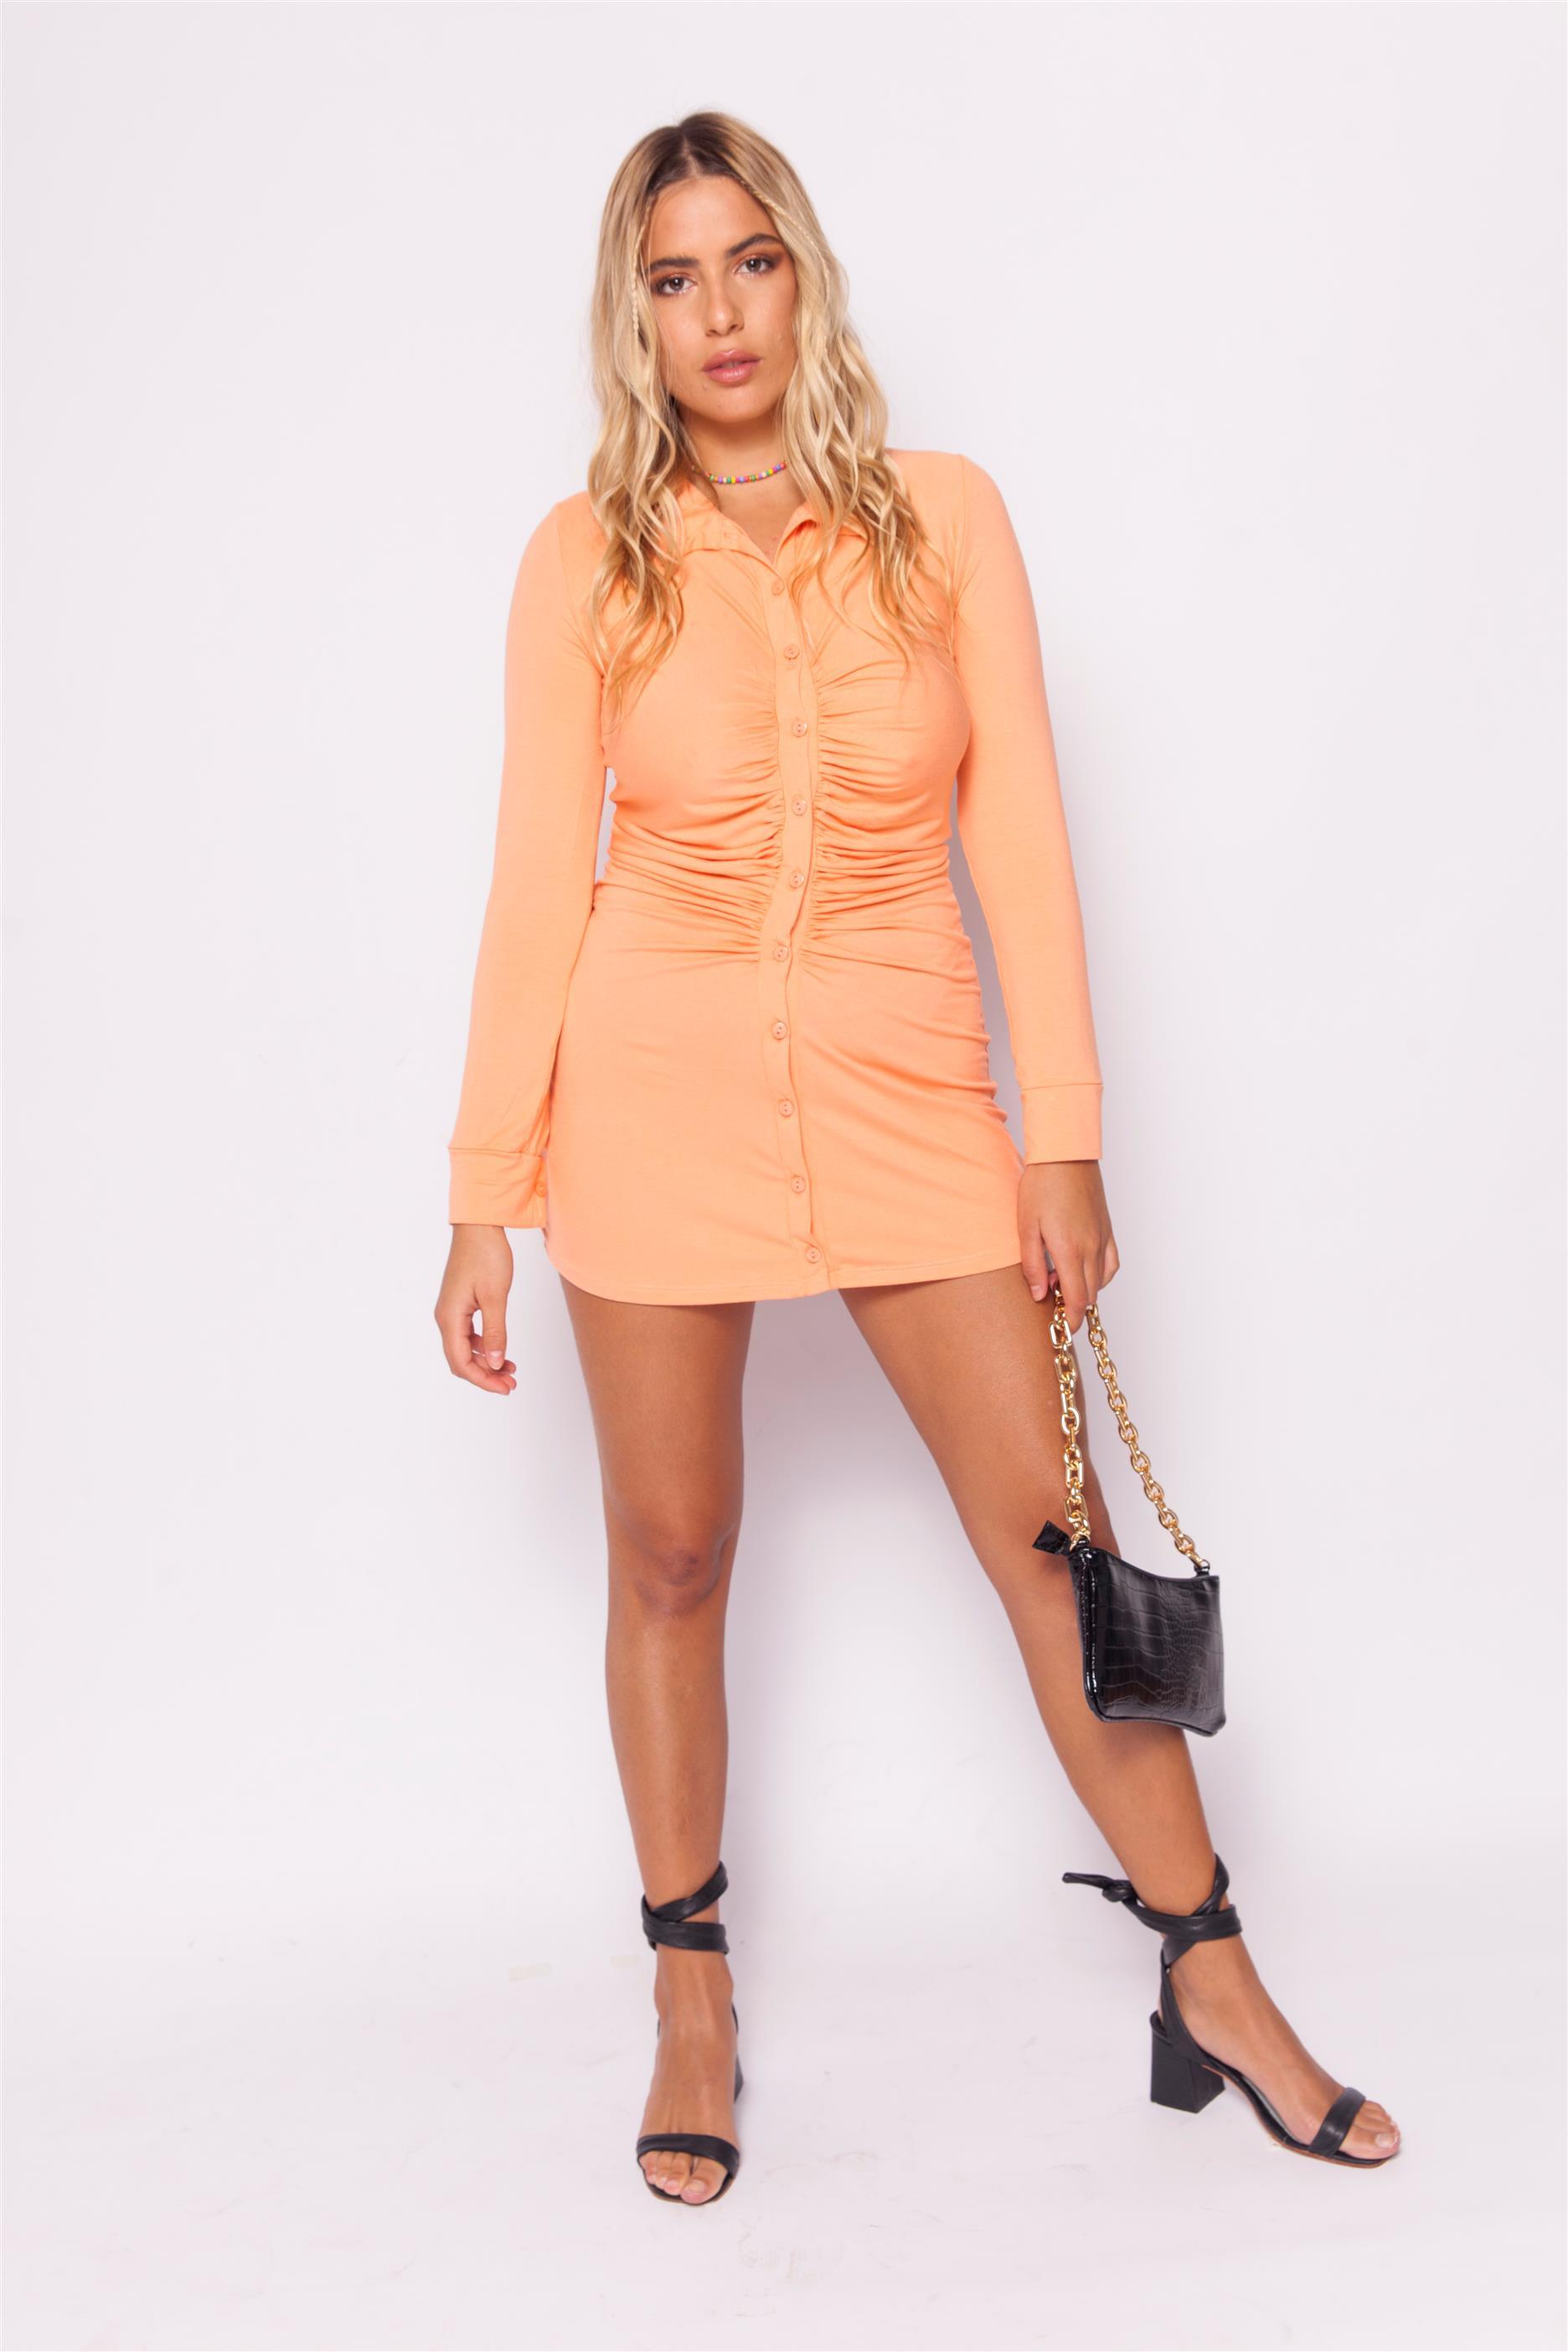 Vestido REBEL S/M - L/XL